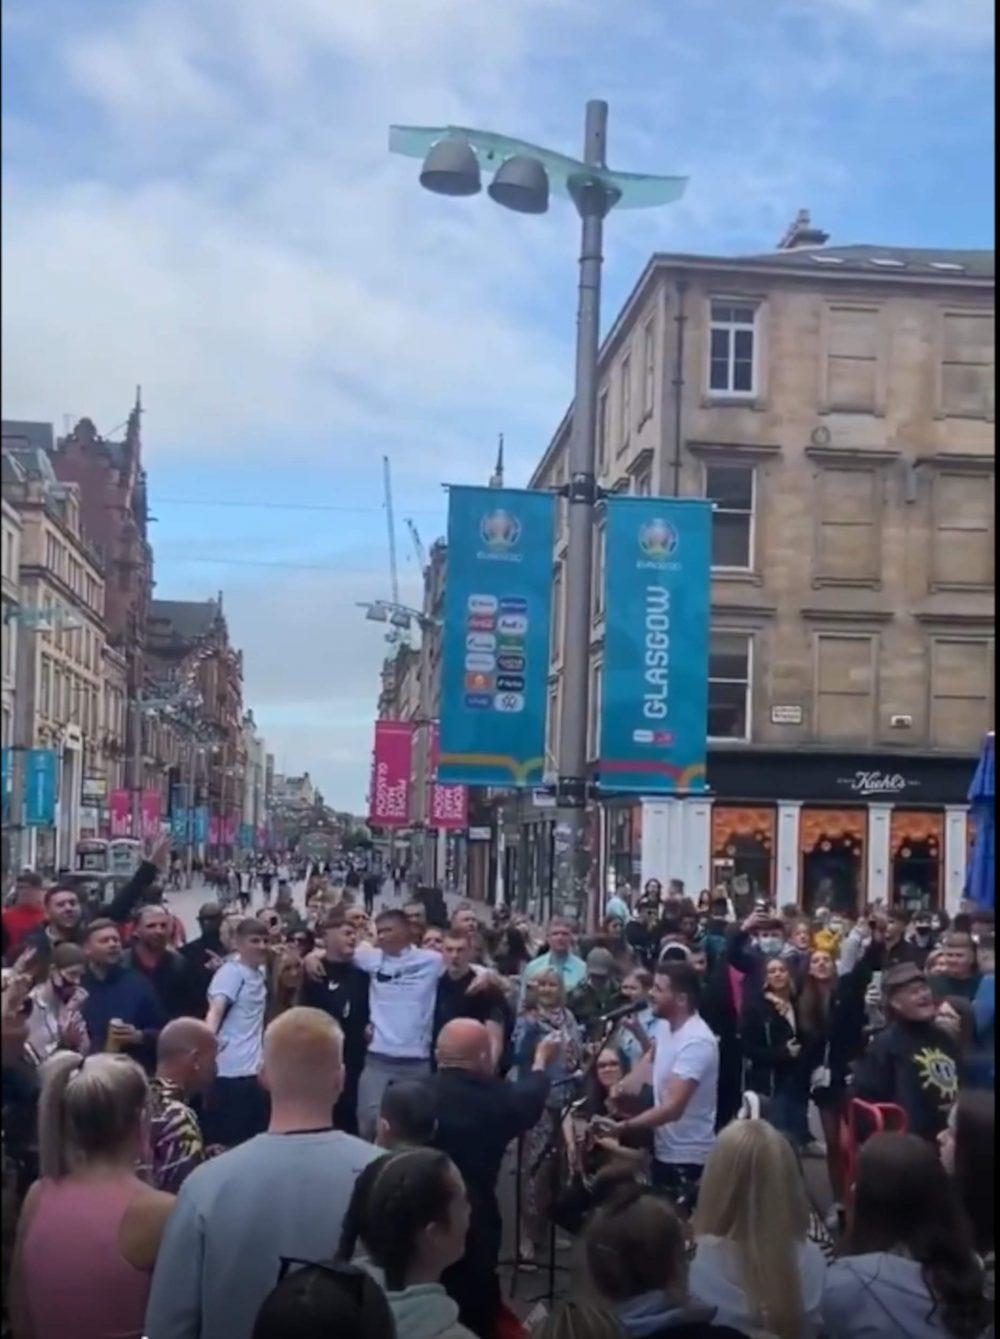 Champagne Supernova Crowd Buchanan Street - Scottish News